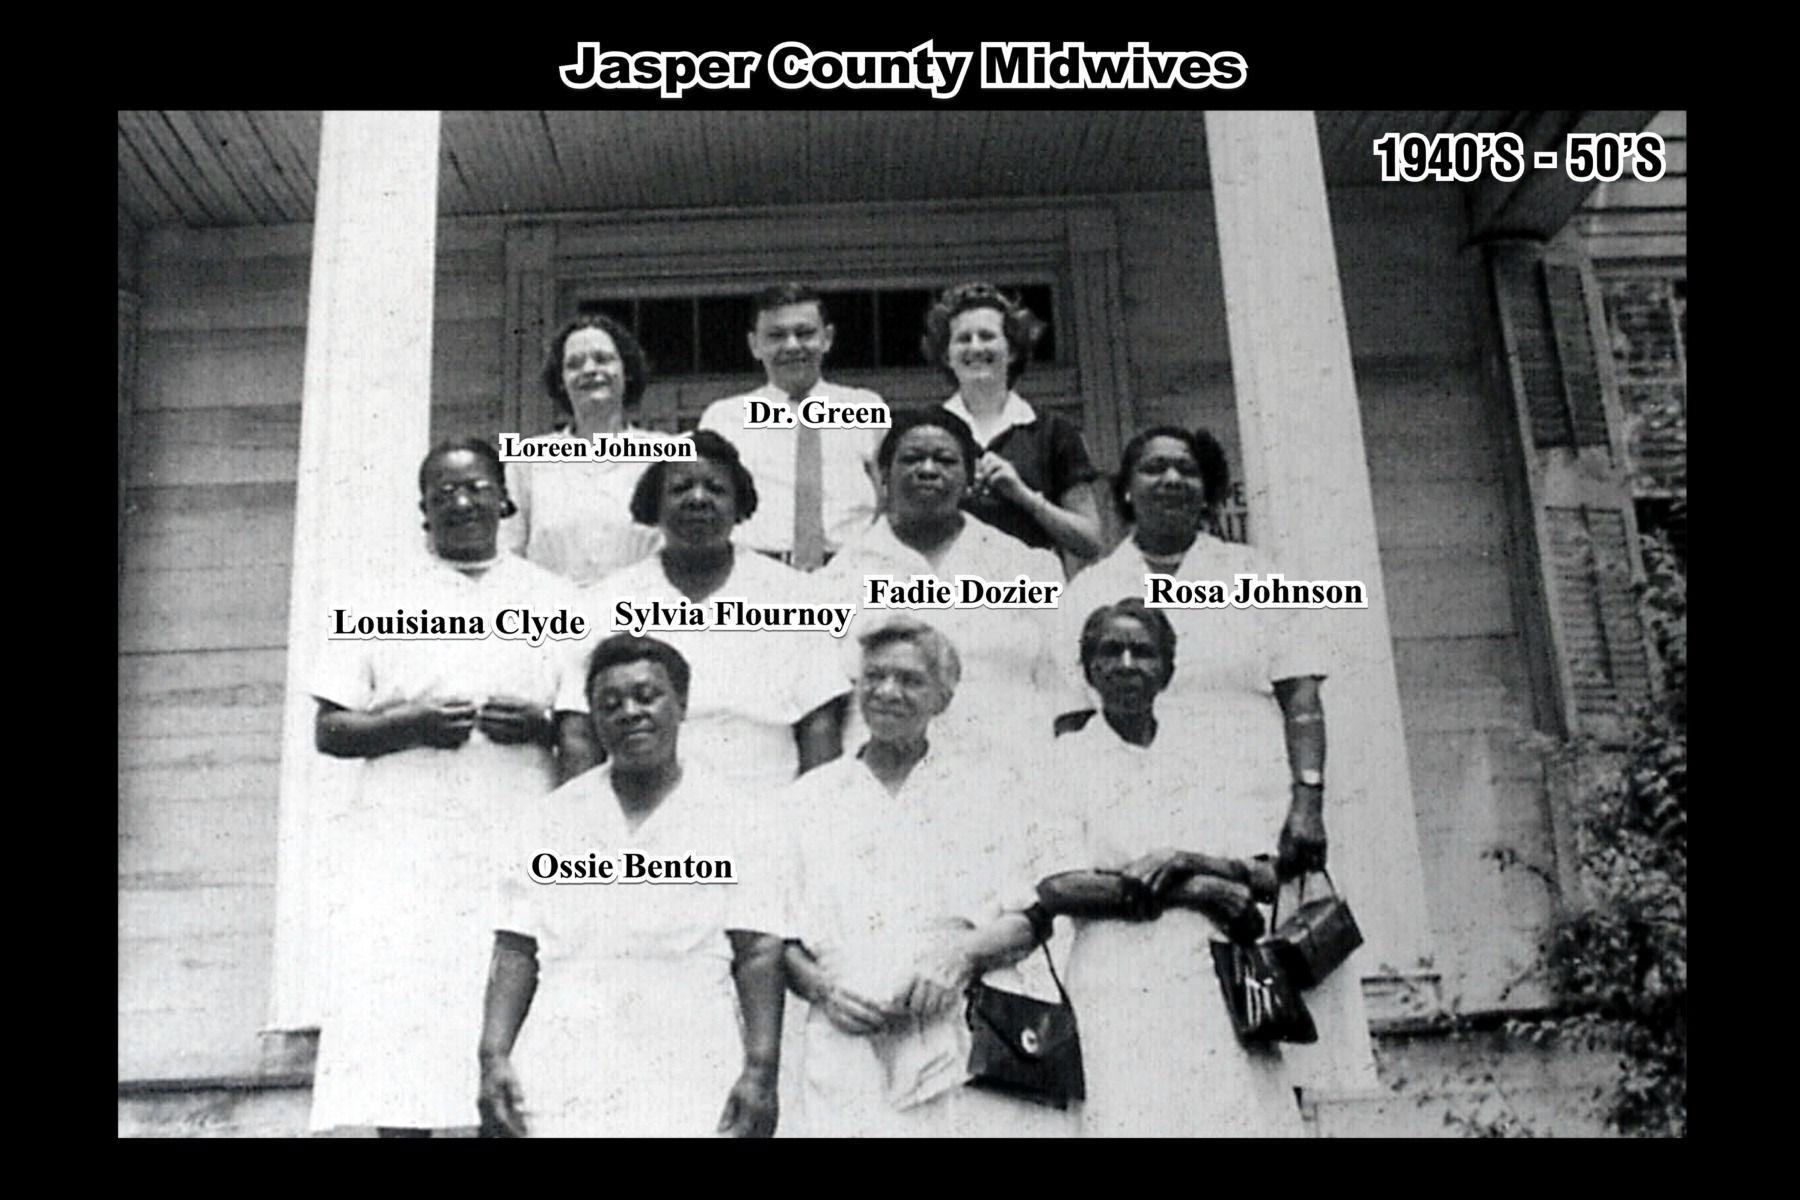 Midwives of Jasper County, GA 1940s50s Women in history